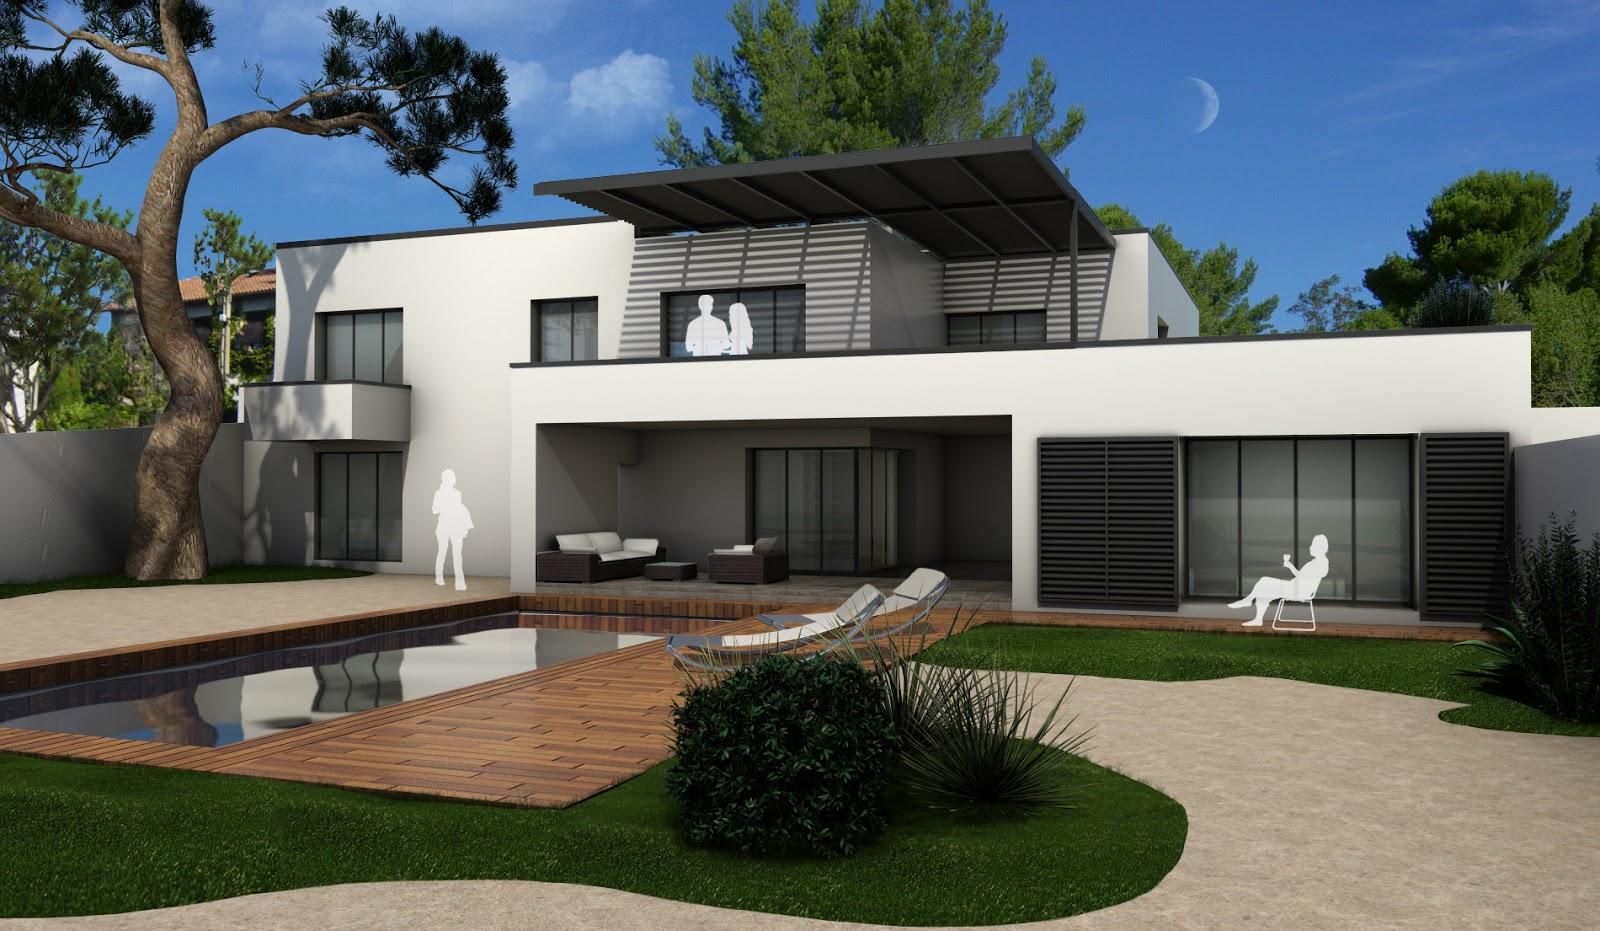 designer d 39 espace graphiste 3d architectural villa les angles gard at home architecture. Black Bedroom Furniture Sets. Home Design Ideas